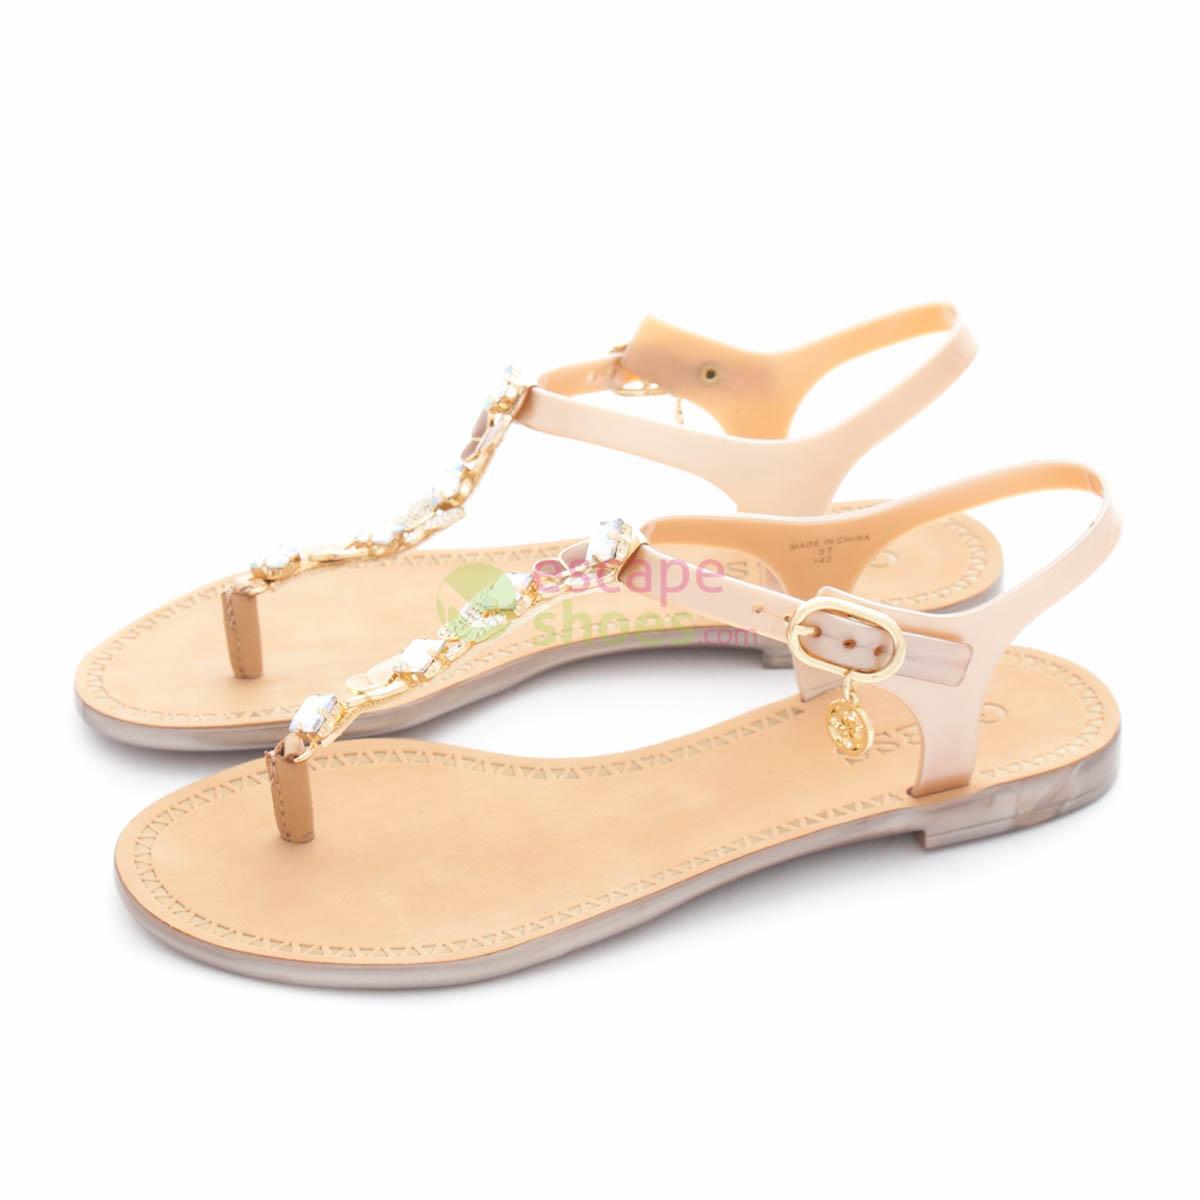 fd8ed3afce72b Buy your Sandals GUESS Rubber Adalinn Gold FLAIN2RUB21 here